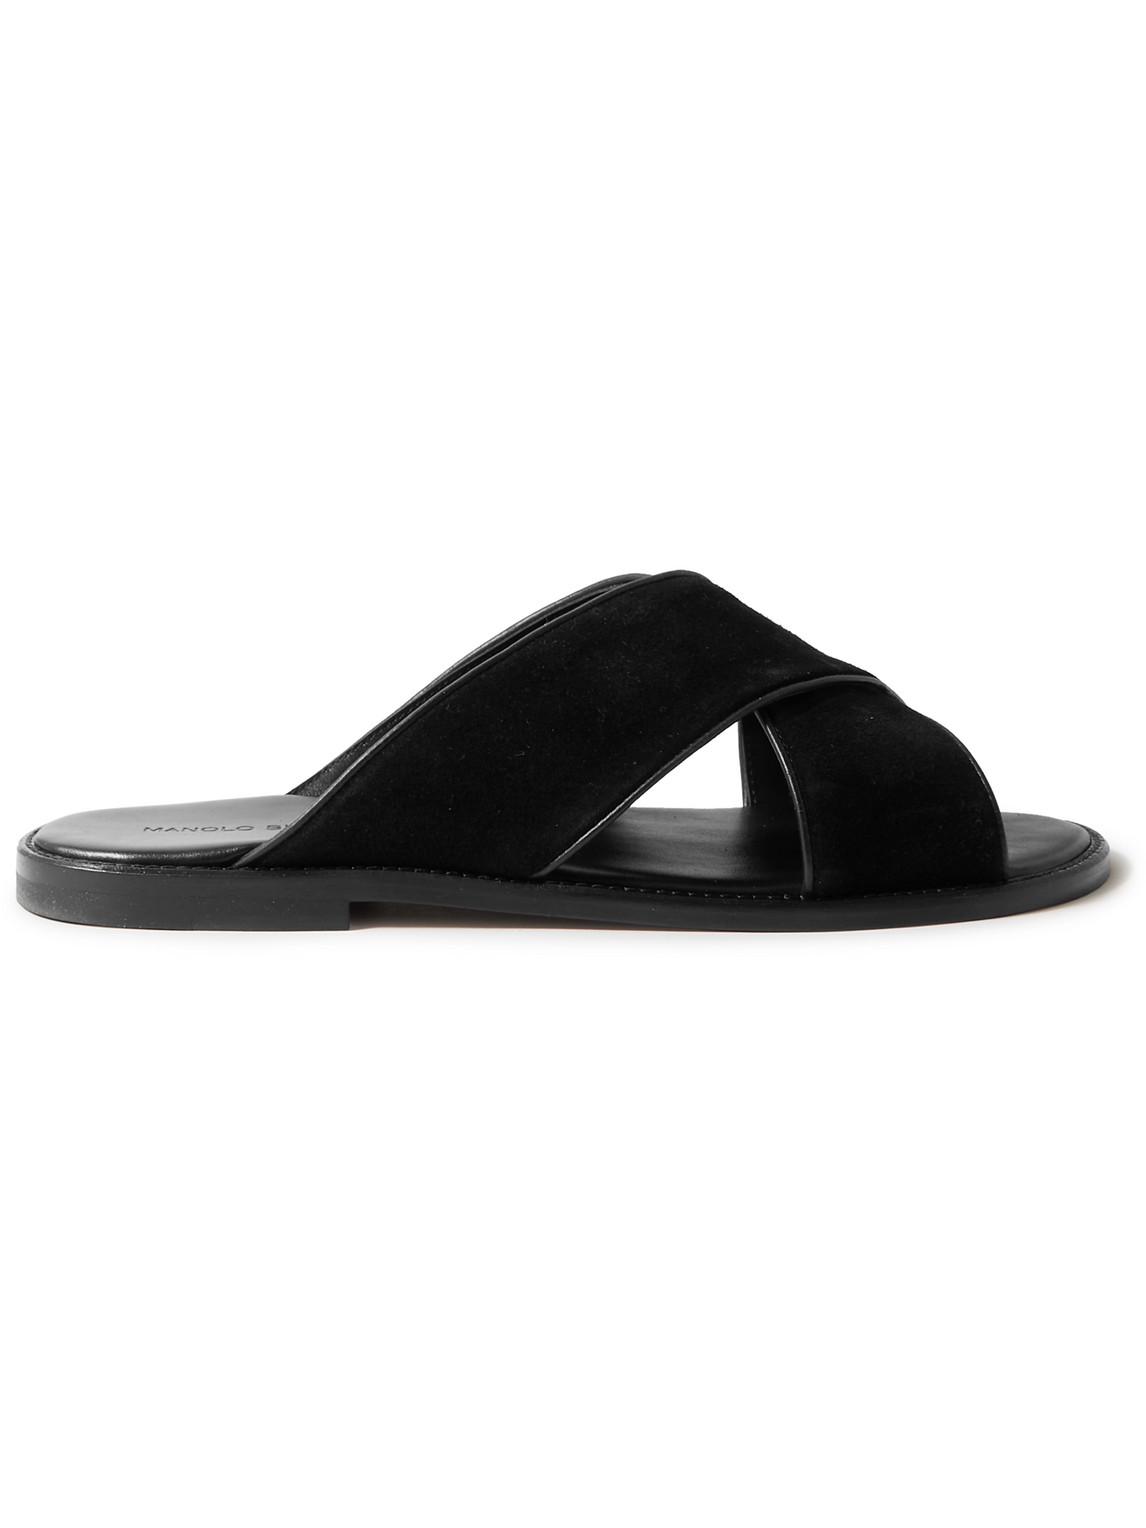 Manolo Blahnik Otawi Leather-trimmed Suede Sandals In Black